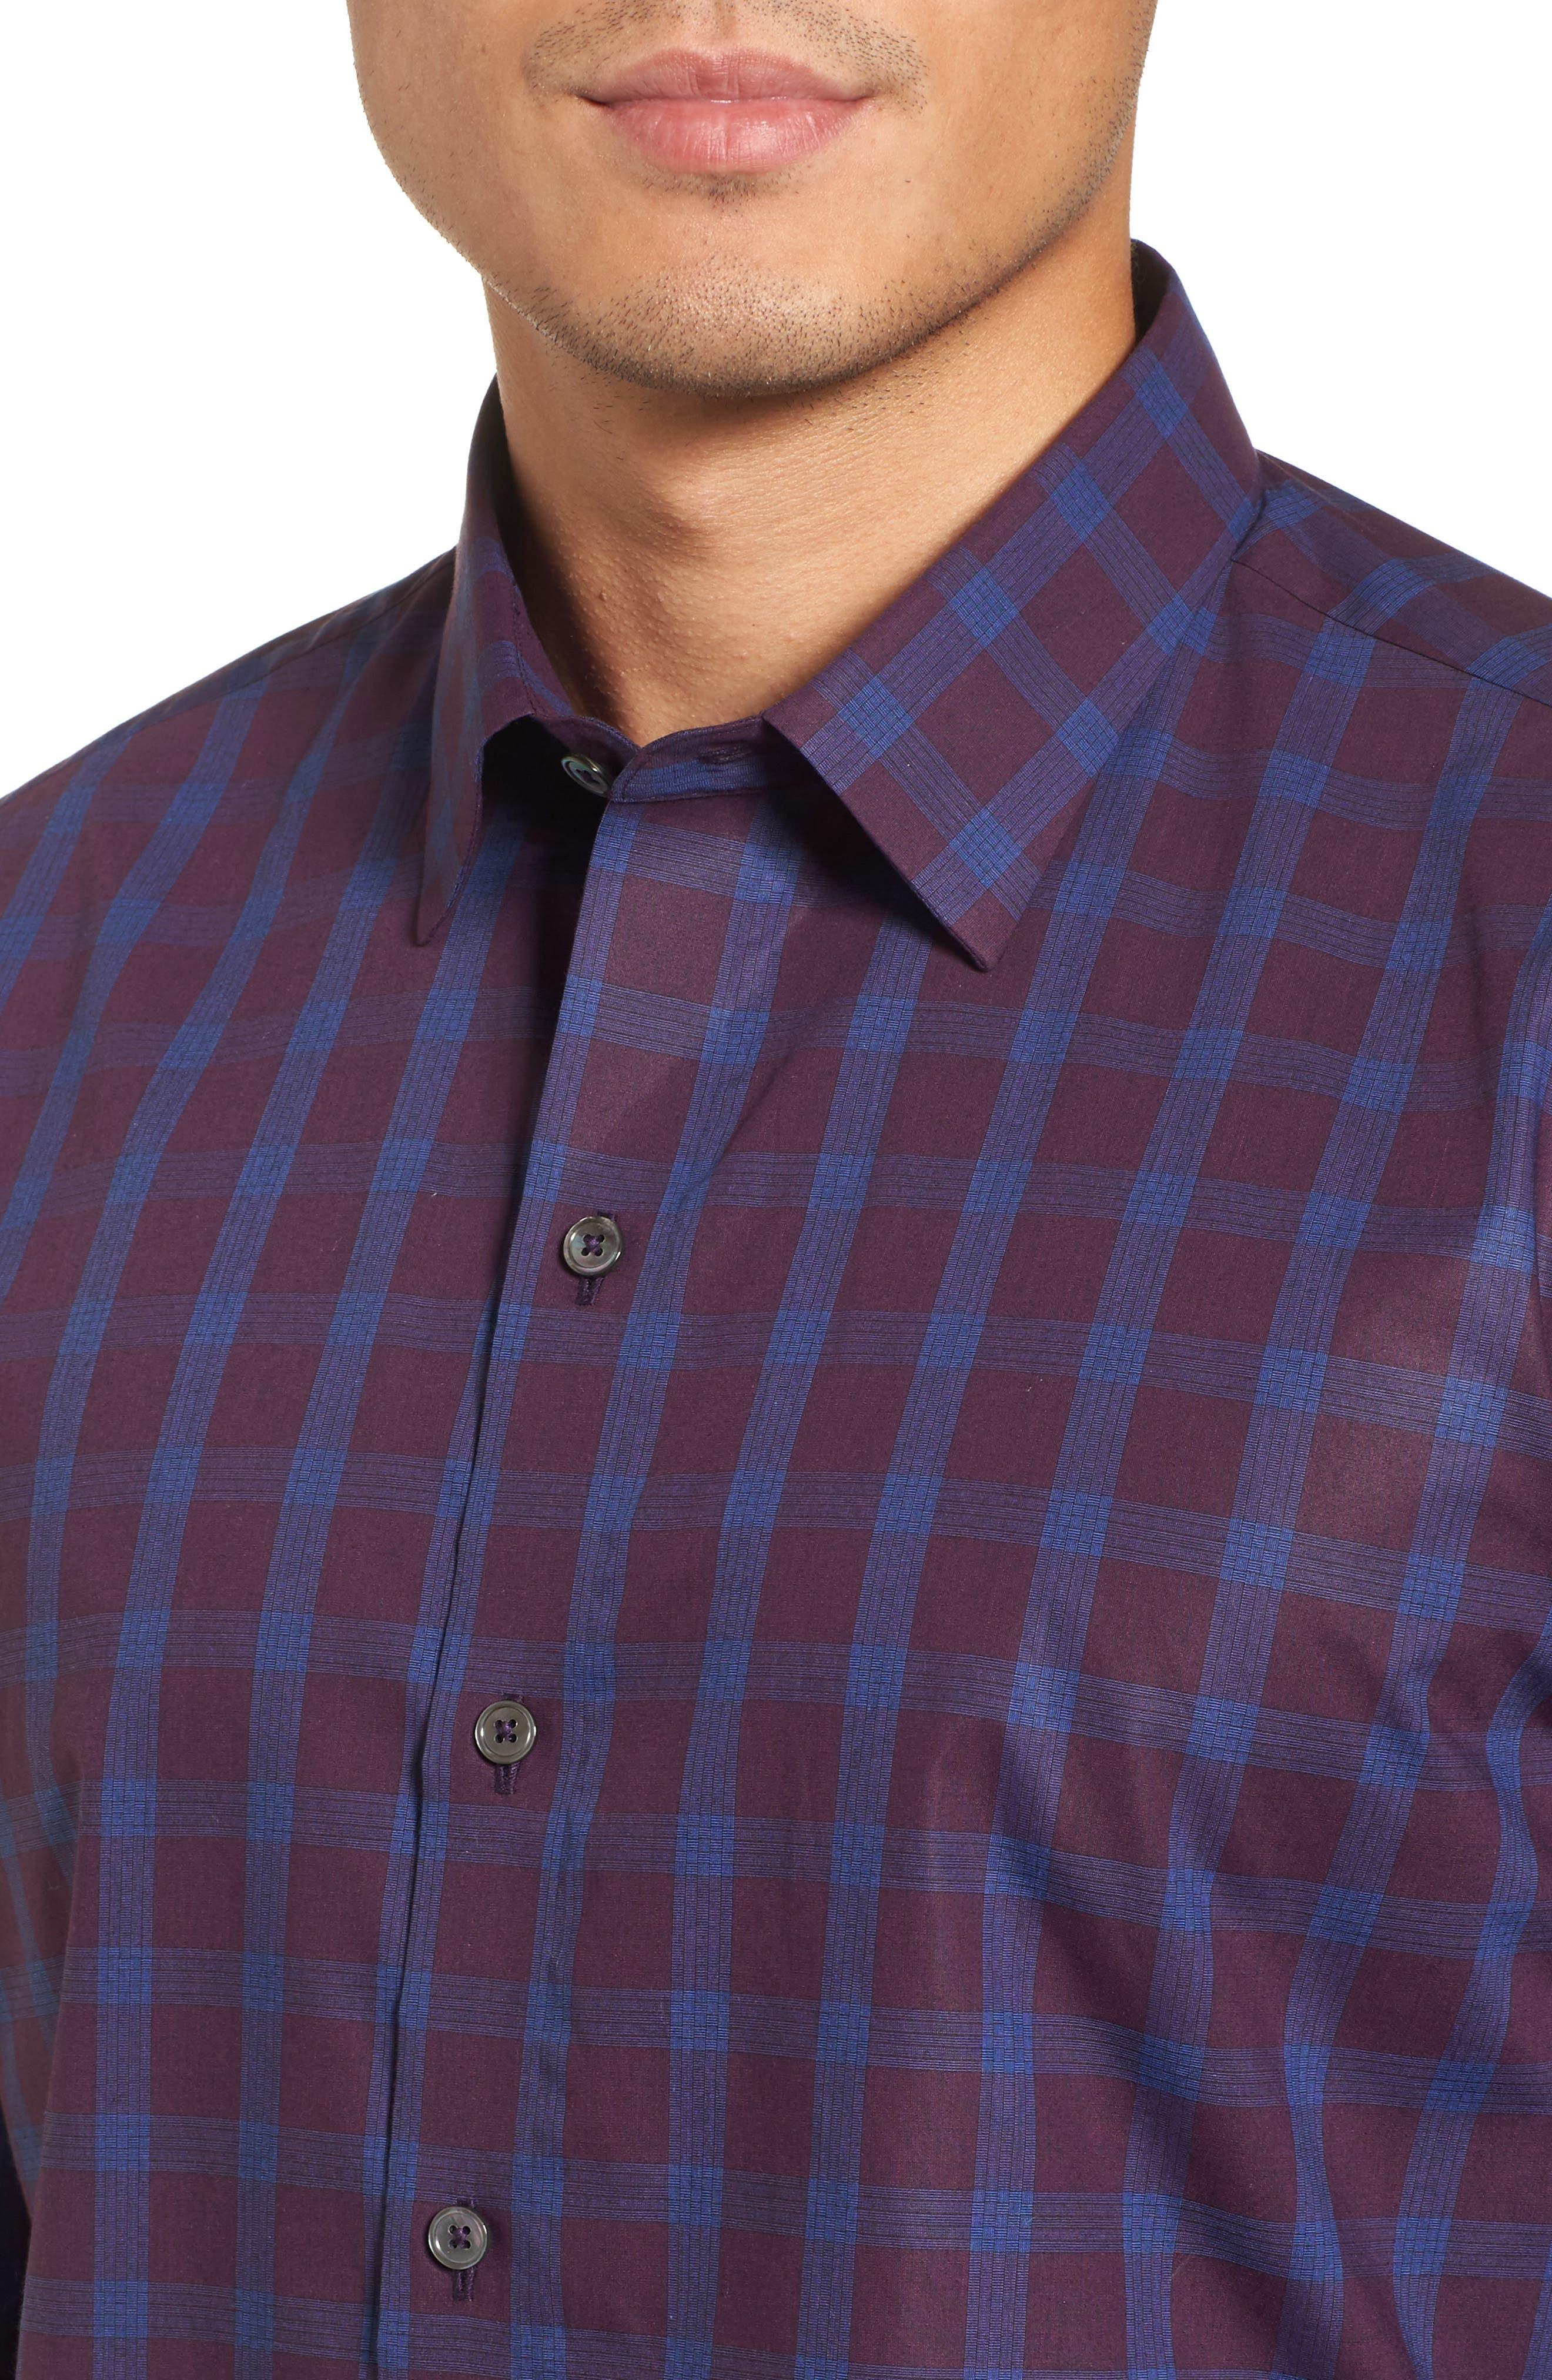 Raymond Check Sport Shirt,                             Alternate thumbnail 4, color,                             Burgundy